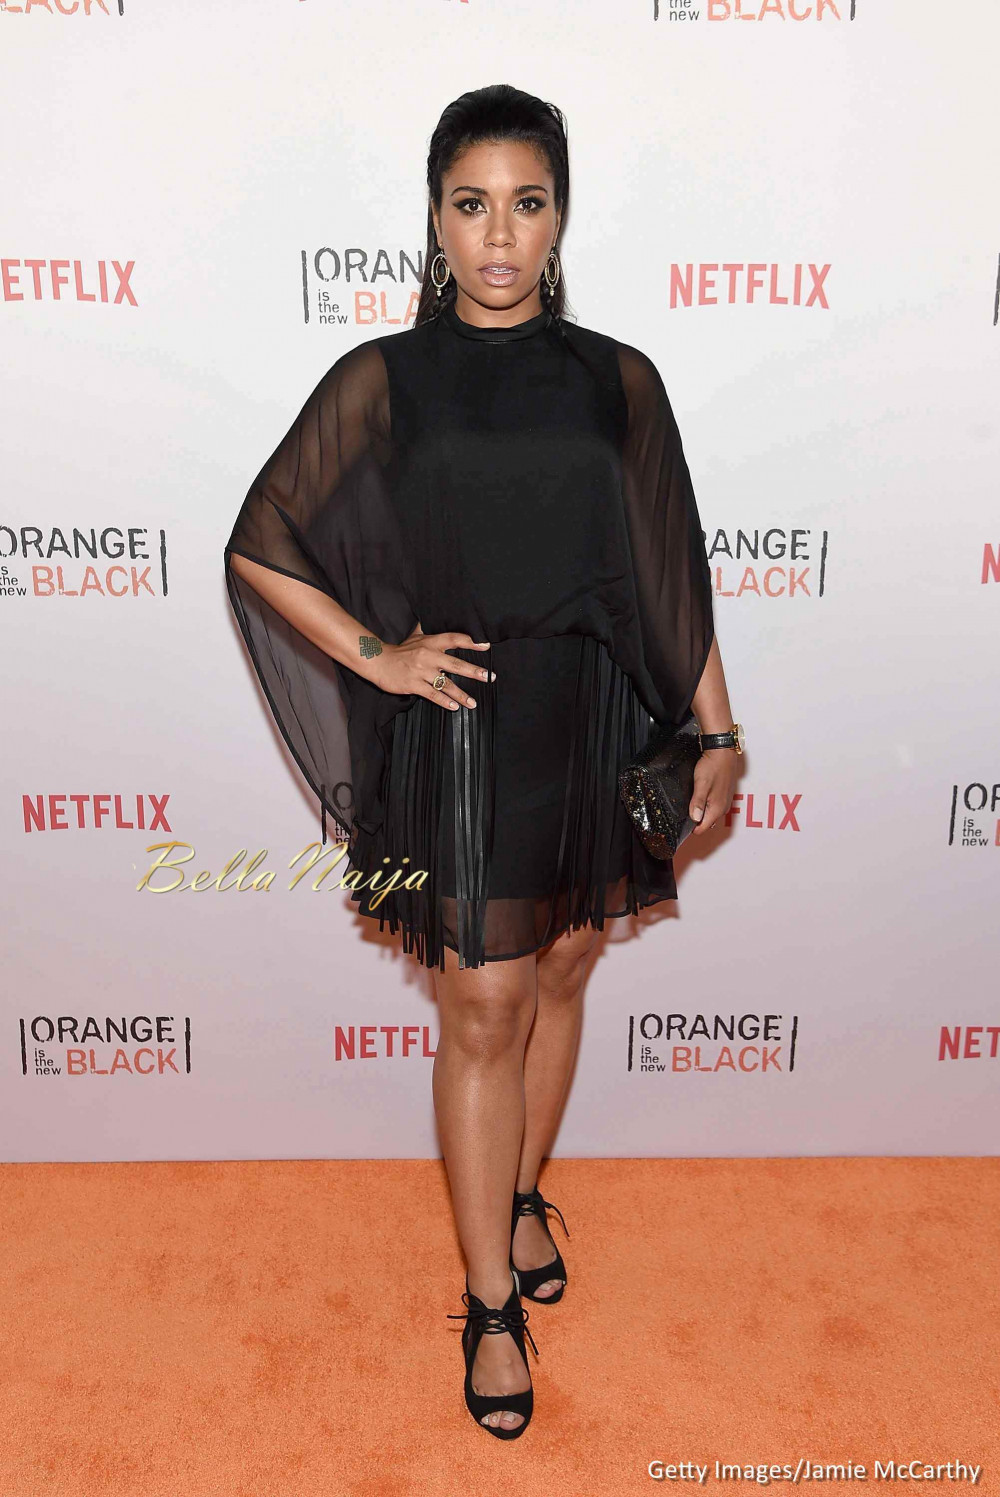 Natasha lyonne yael stone in orange is the new black 20132015 - 1 3